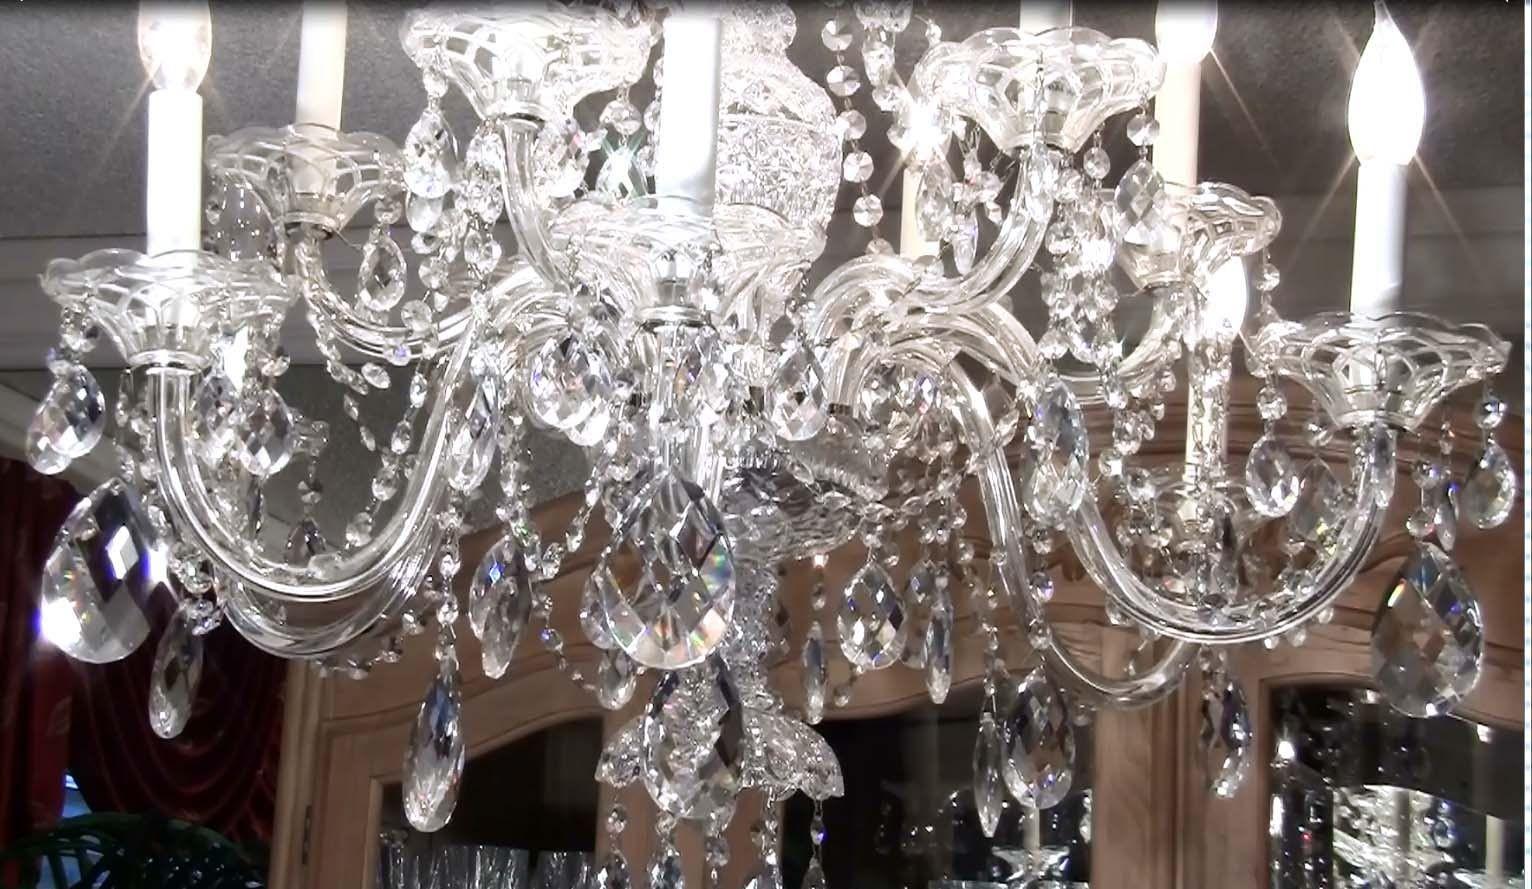 Kristall Kronleuchter Putzen ~ Kristall kronleuchter reinigen groß kristall kronleuchter antik